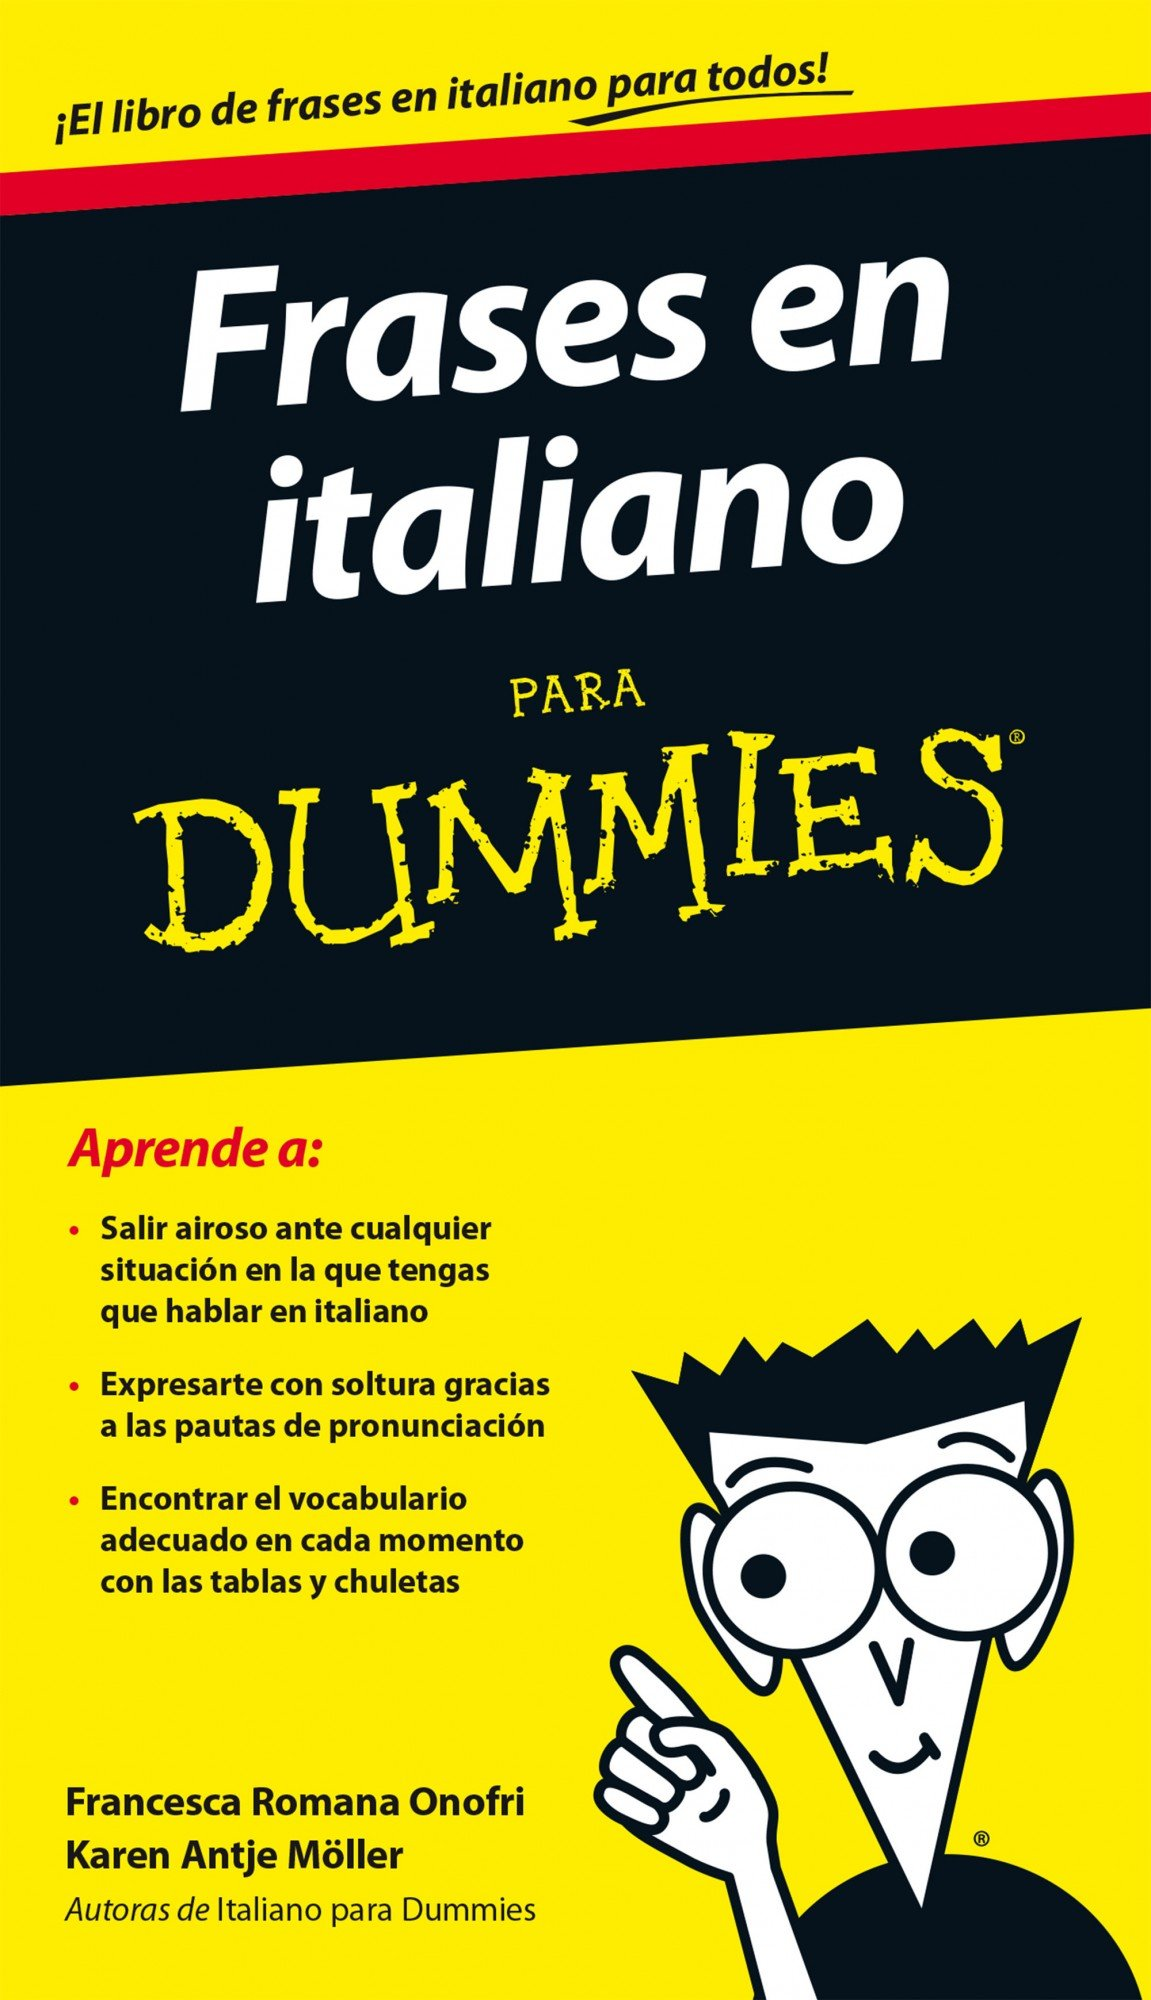 Frases En Italiano Para Dummies Karen Antje Möller Francesca Romana